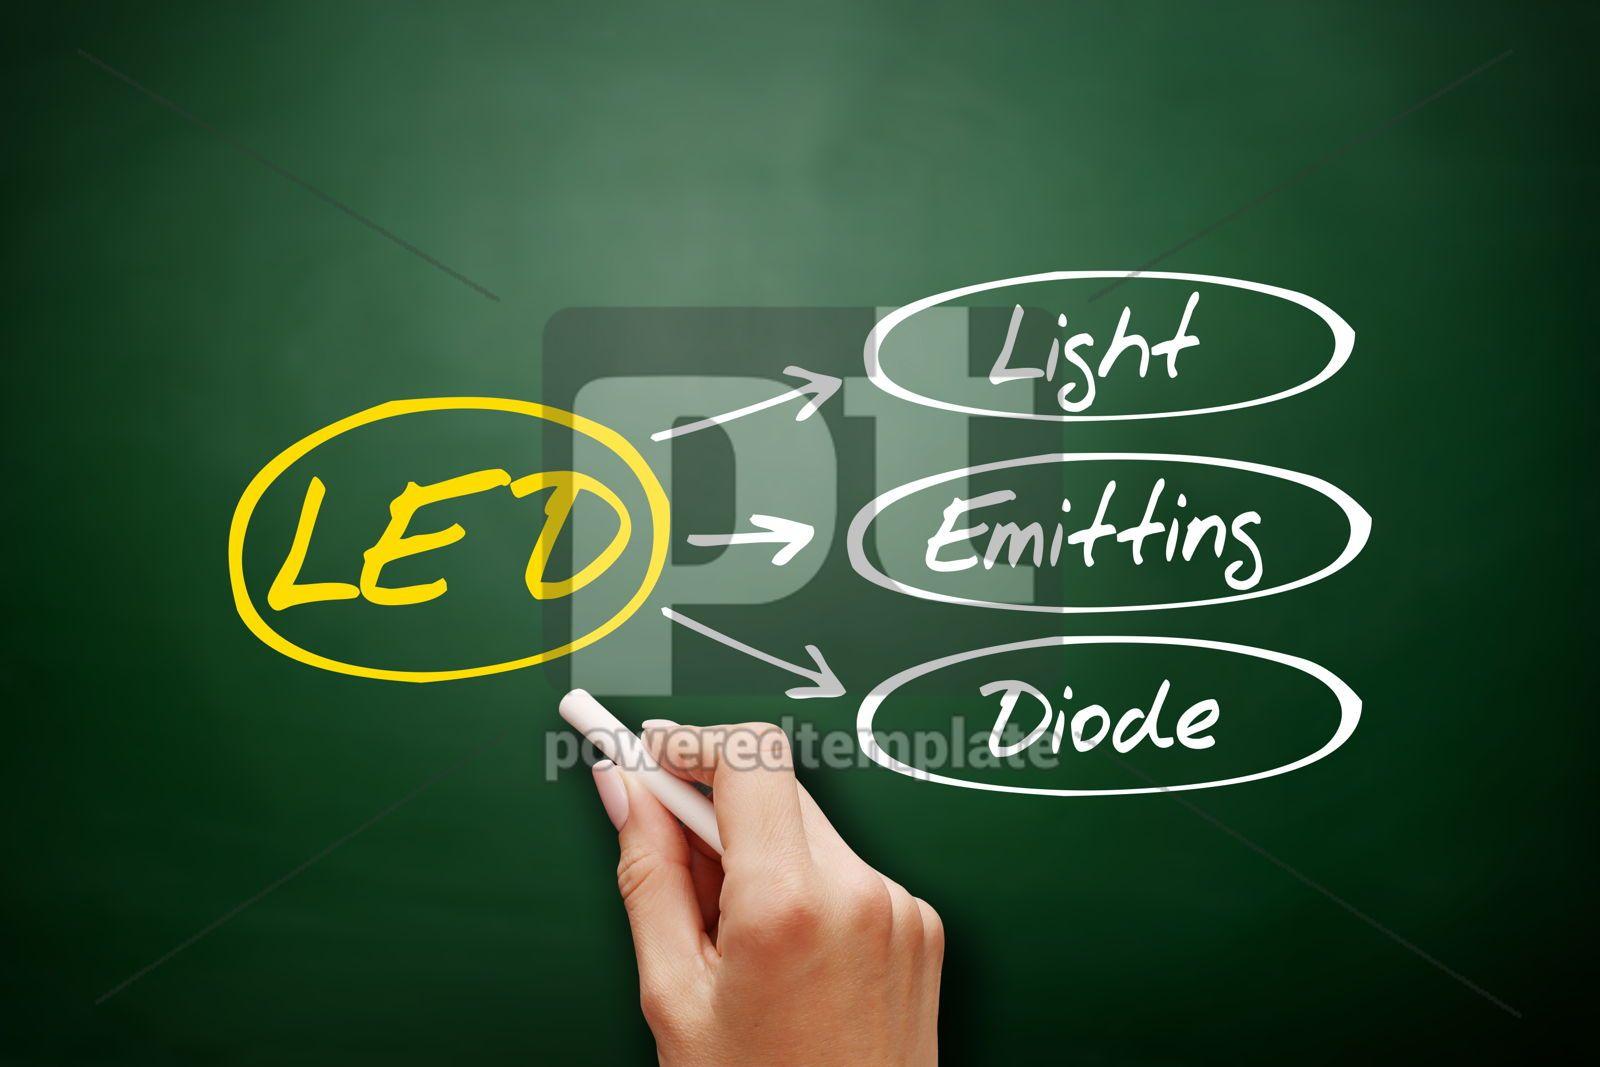 LED Light Emitting Diode technology business concept, 18152, Business — PoweredTemplate.com